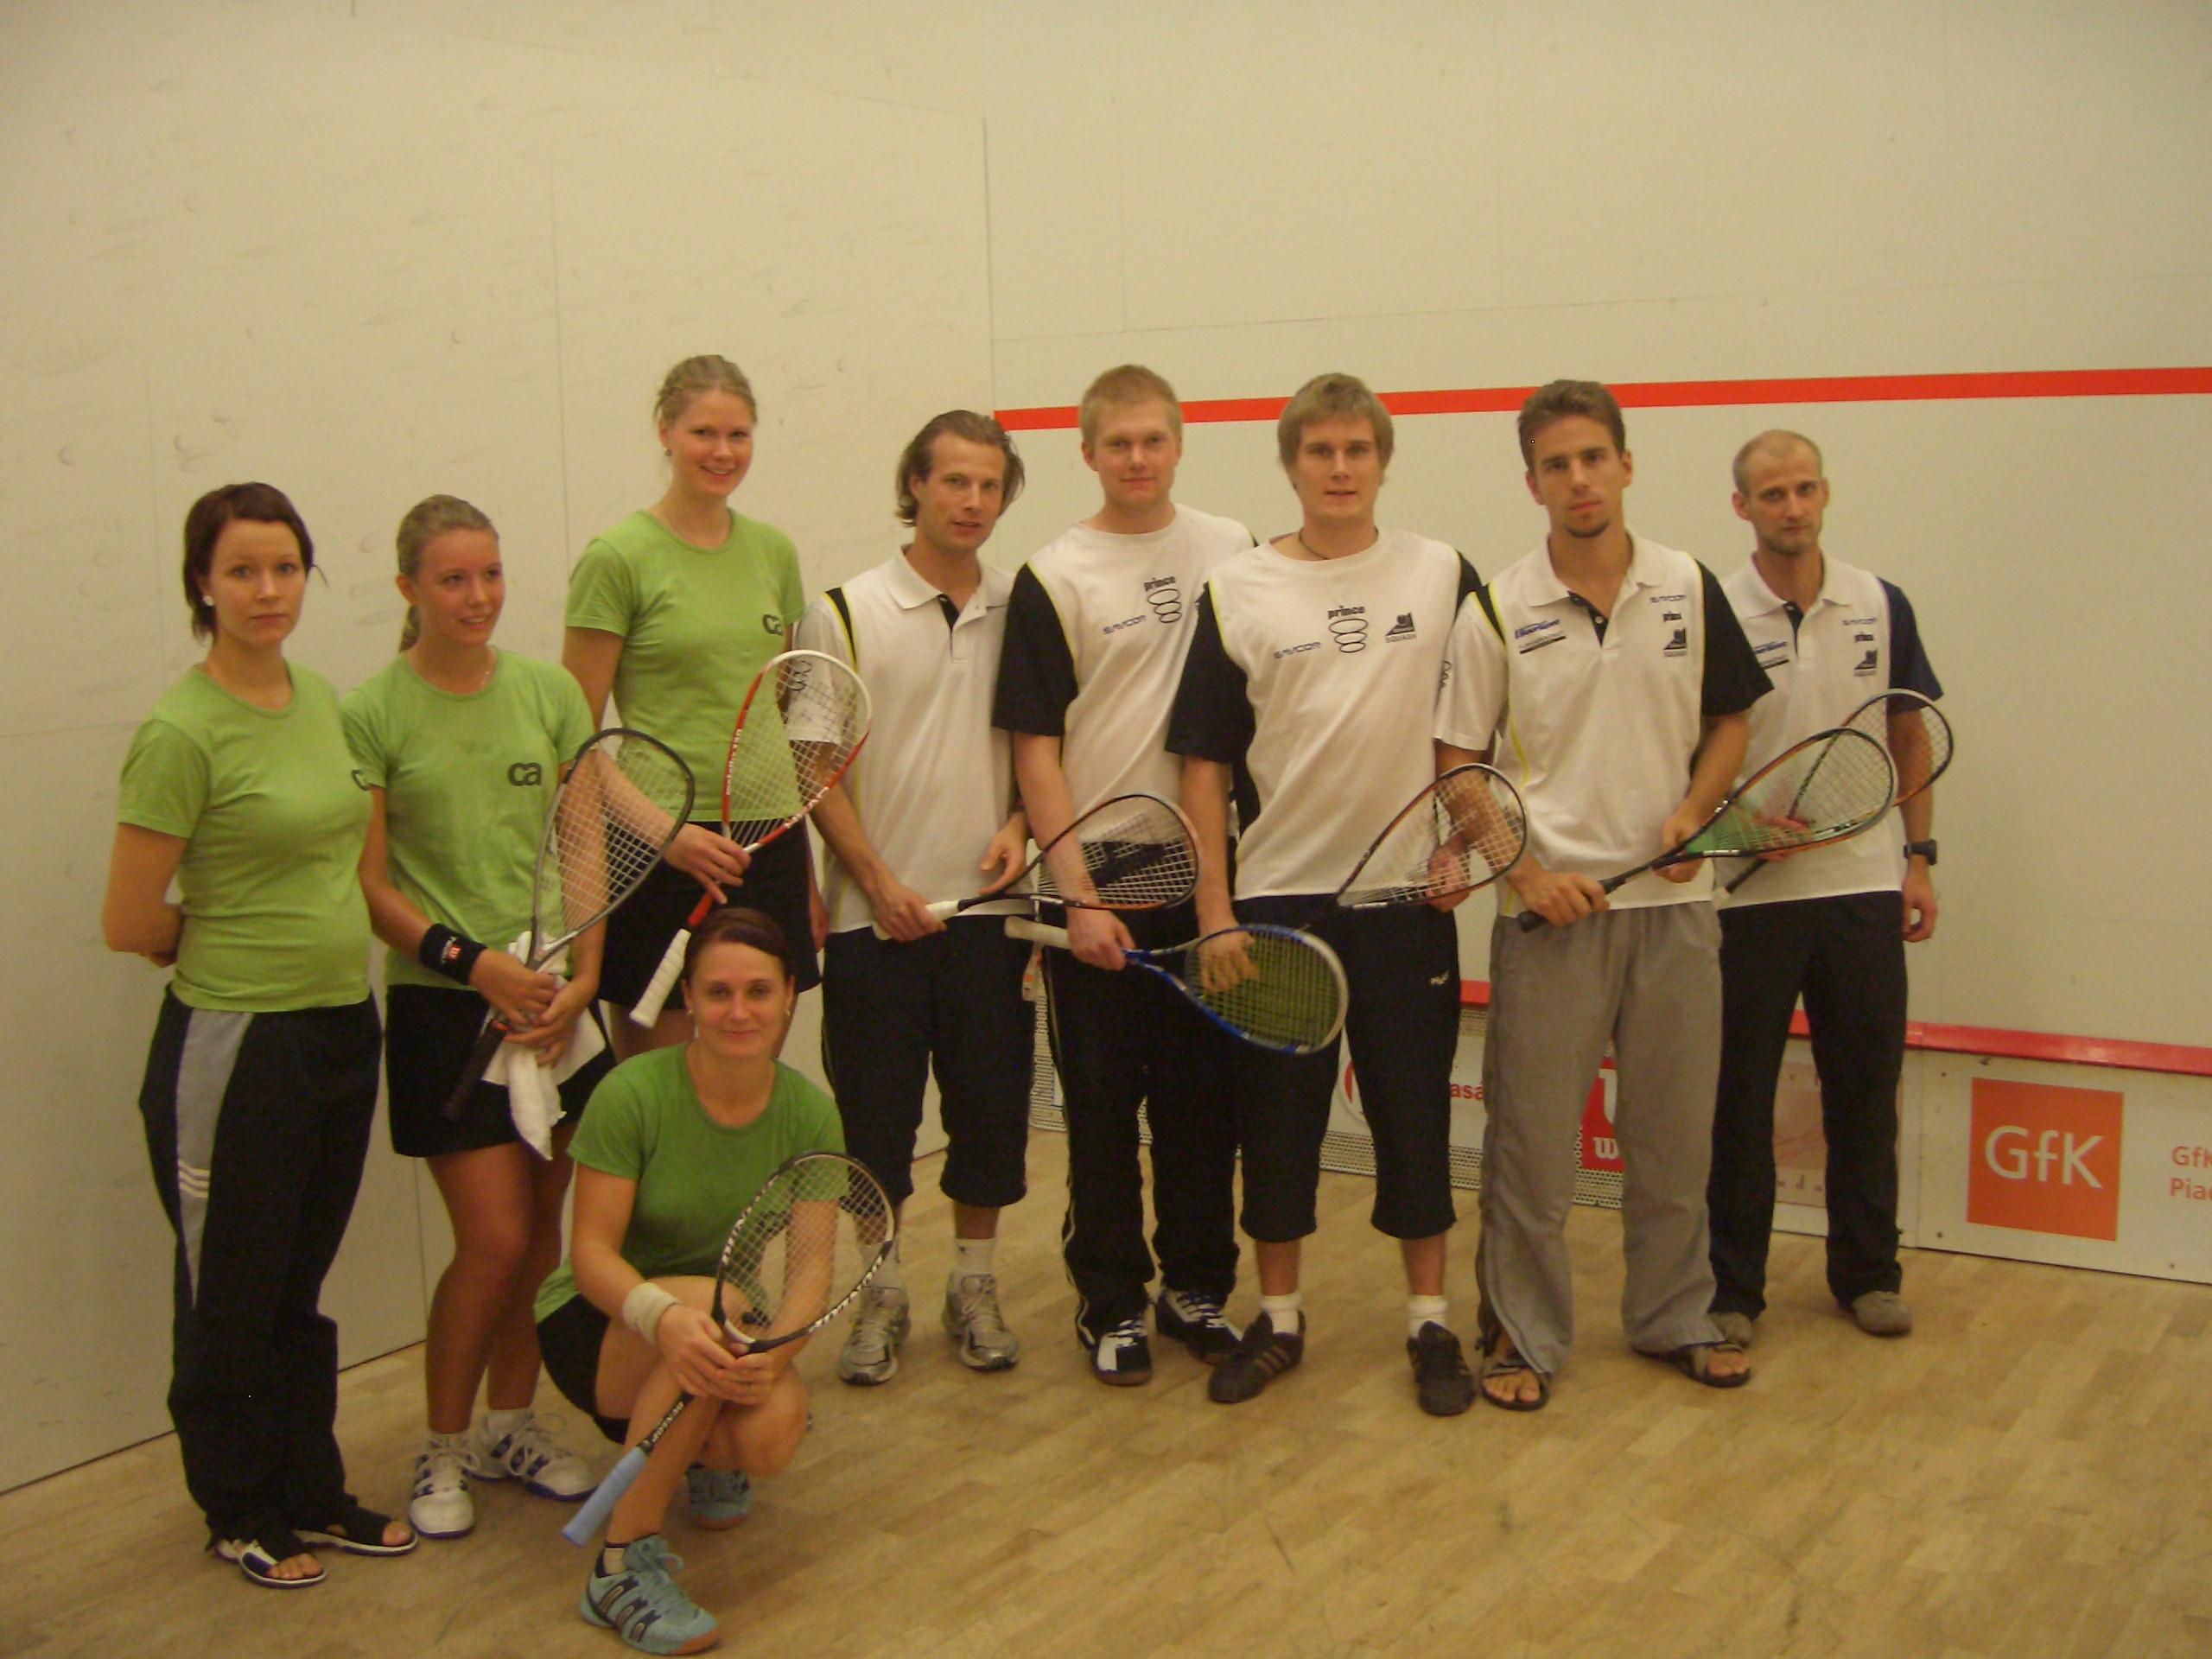 Suomen joukkueet